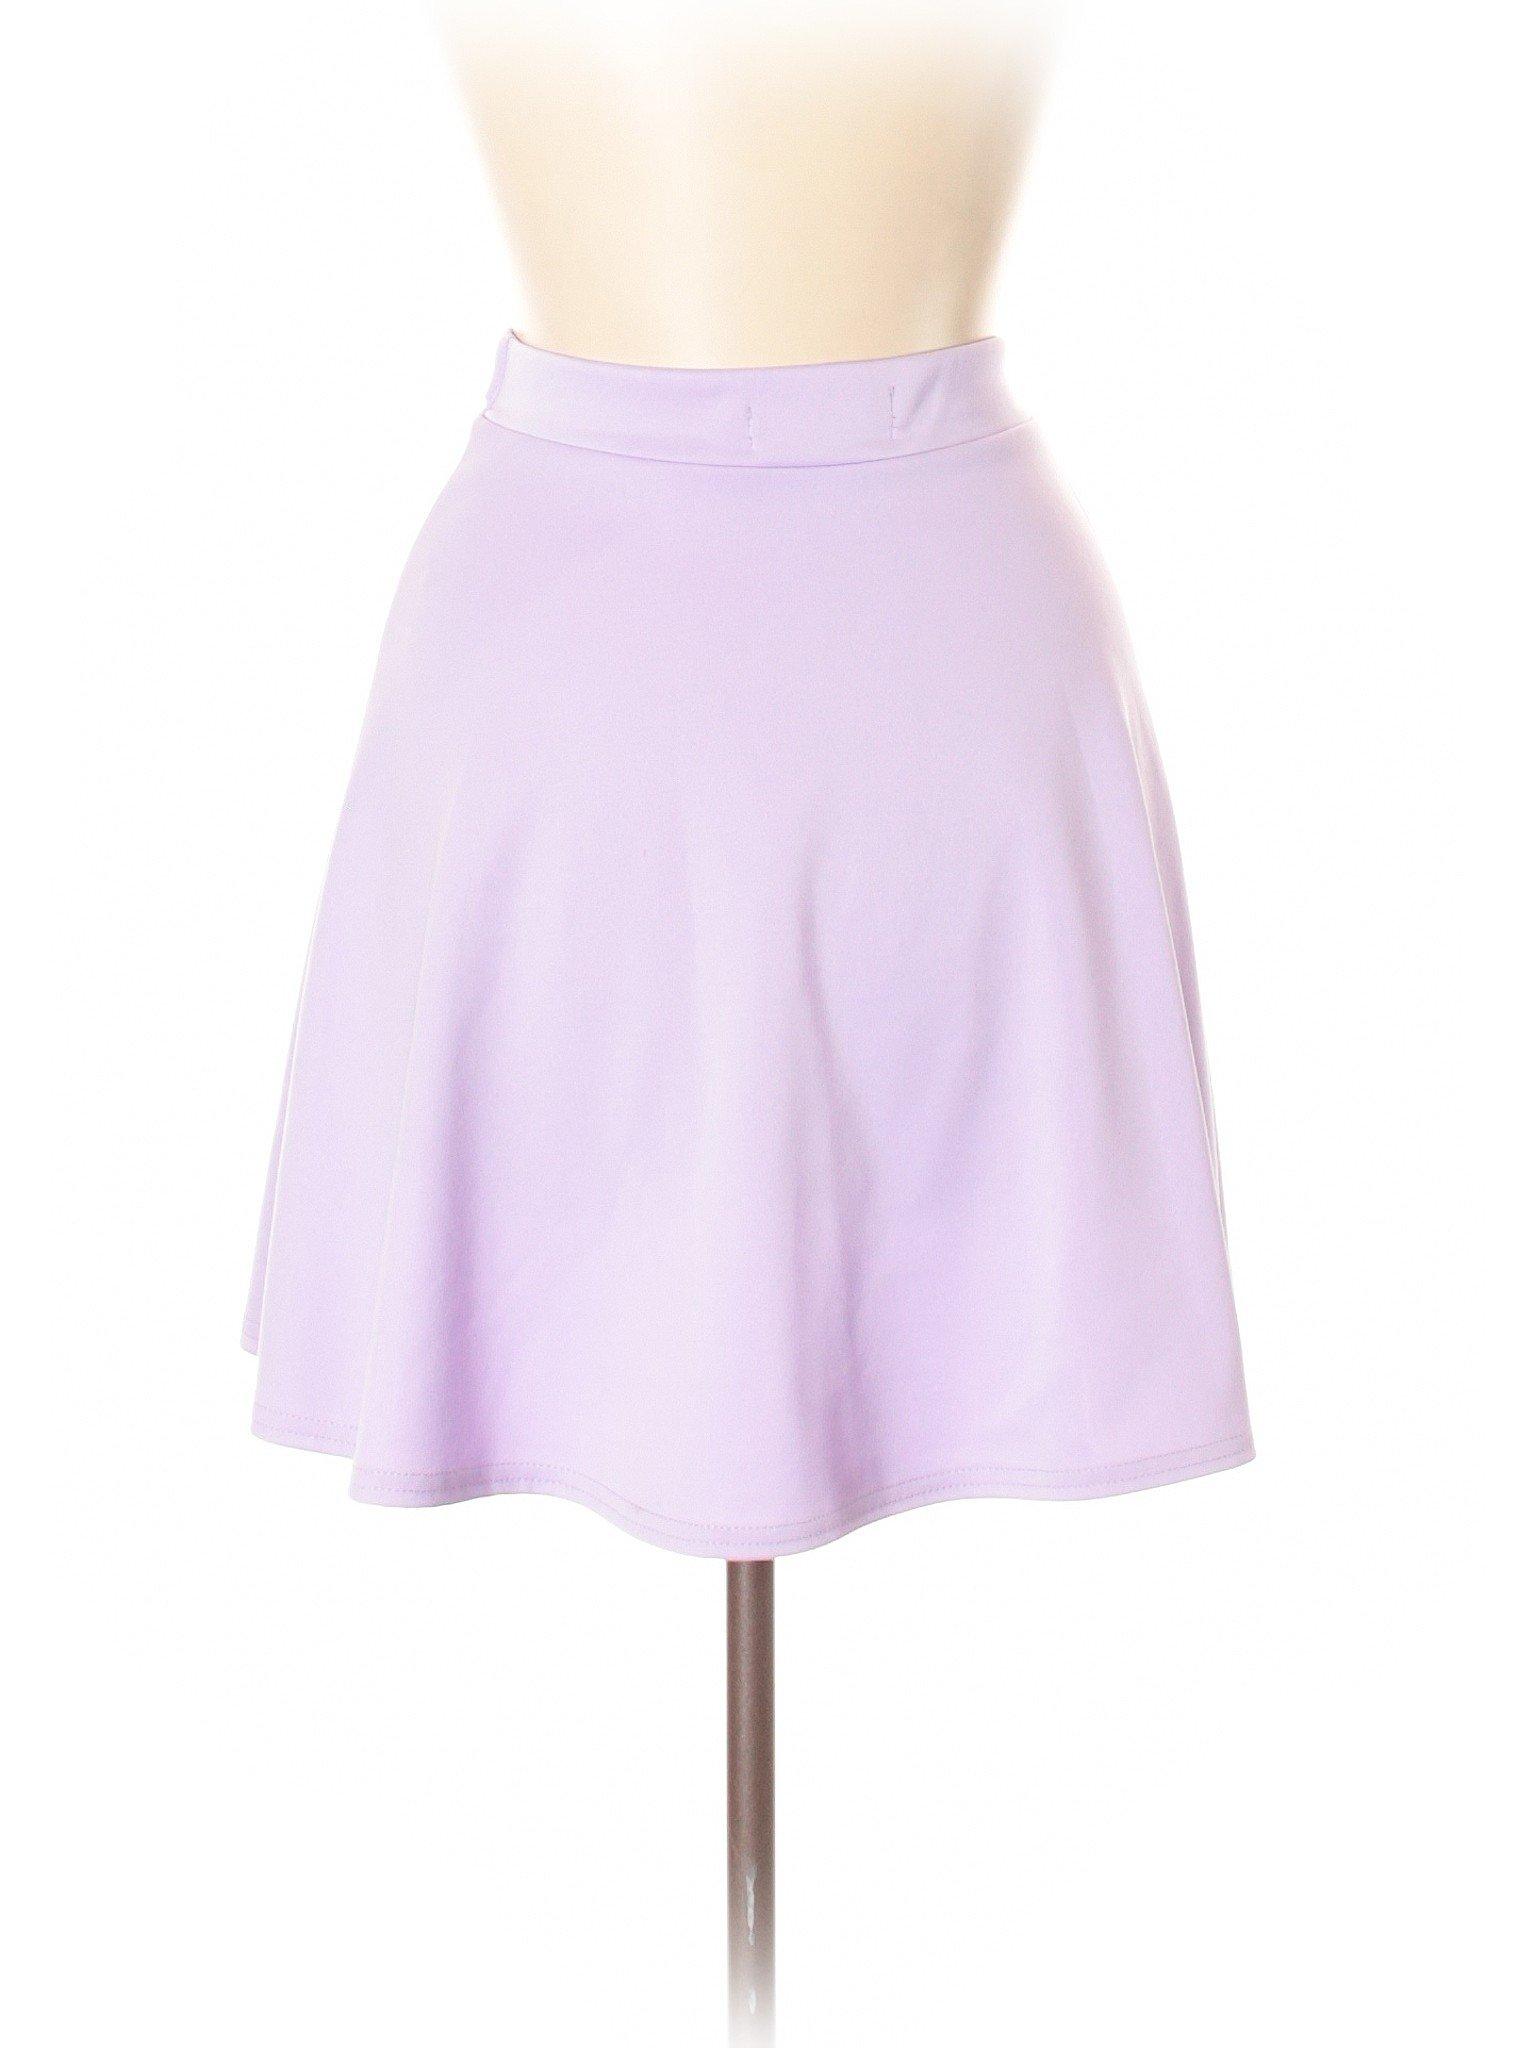 Boutique Boohoo leisure Skirt Boutique Casual 0rXrwqz